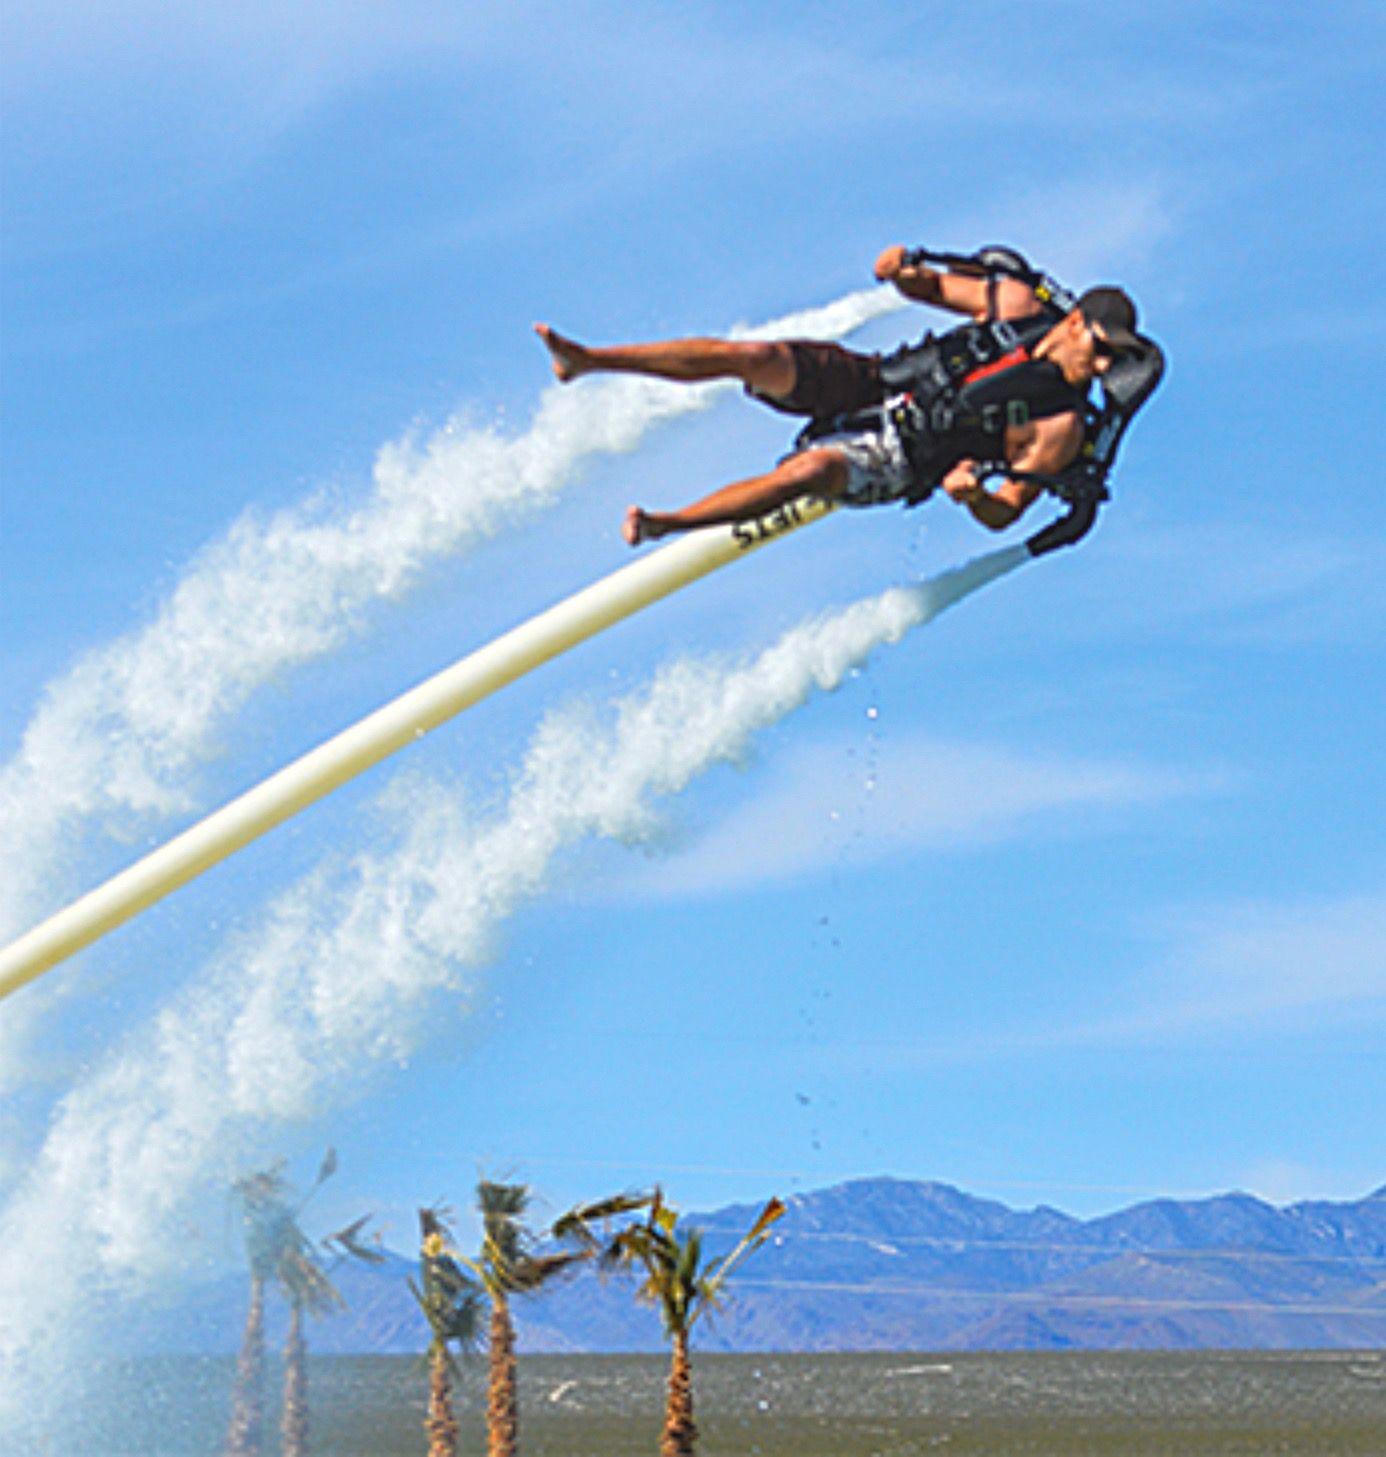 Pin by Fireshout on Water Sports Flyboarding in 2020